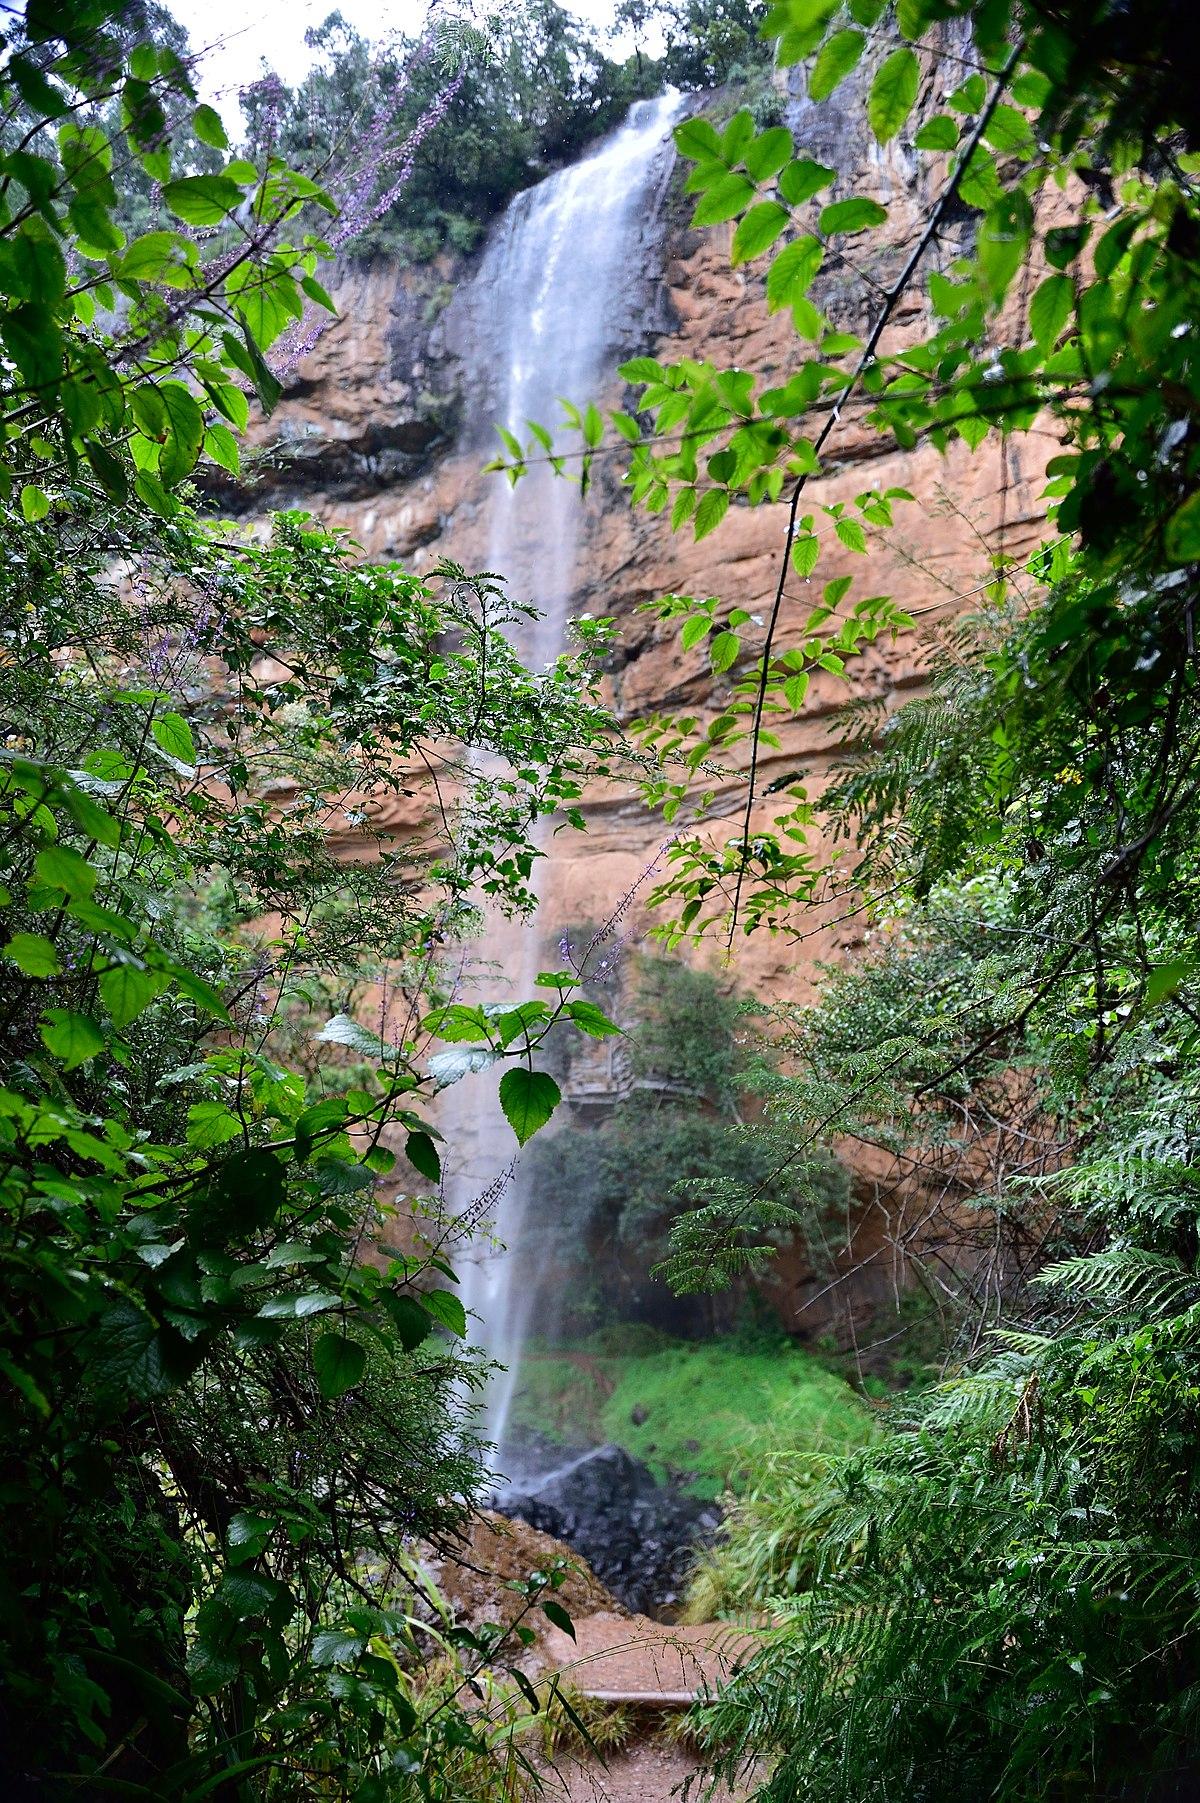 Bridal Veil Falls Oregon - Waterfall in Oregon - Thousand